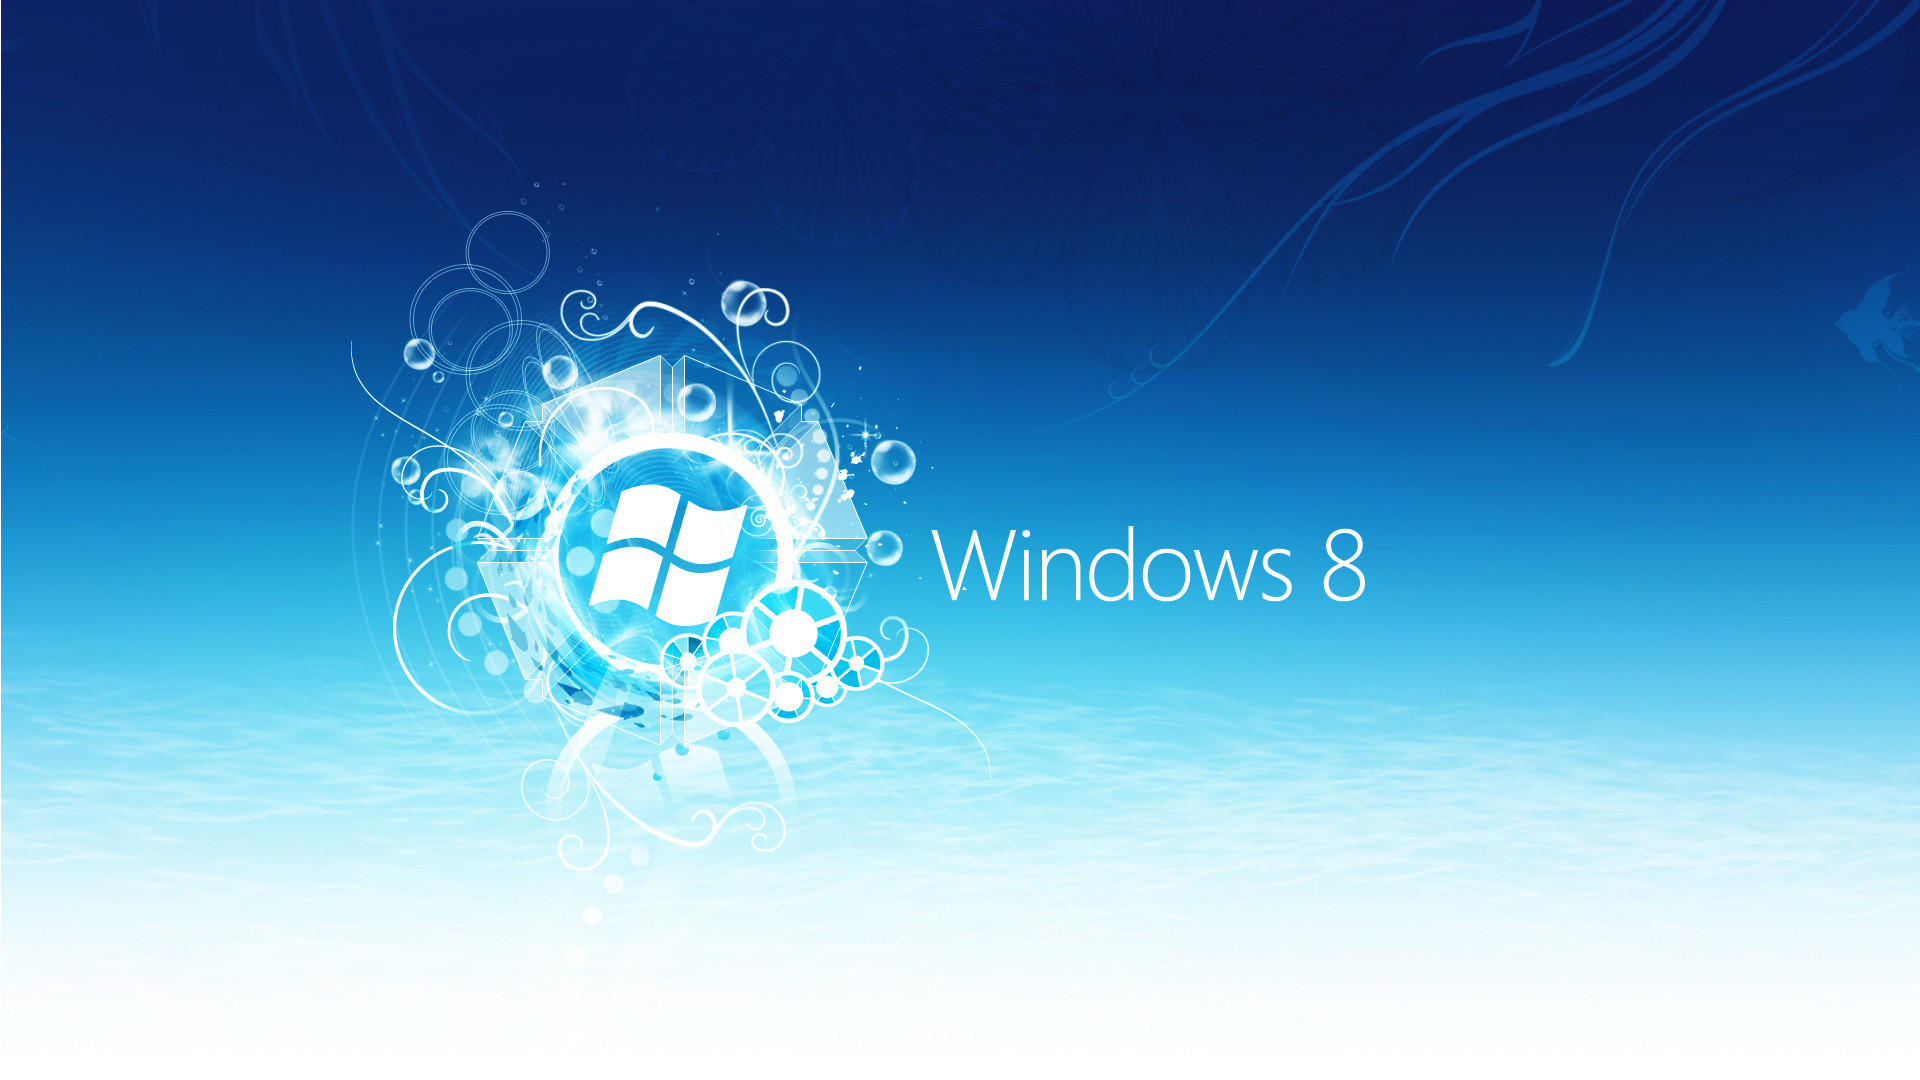 windows-reymond-p-hd-wallpaper-windows.jpg